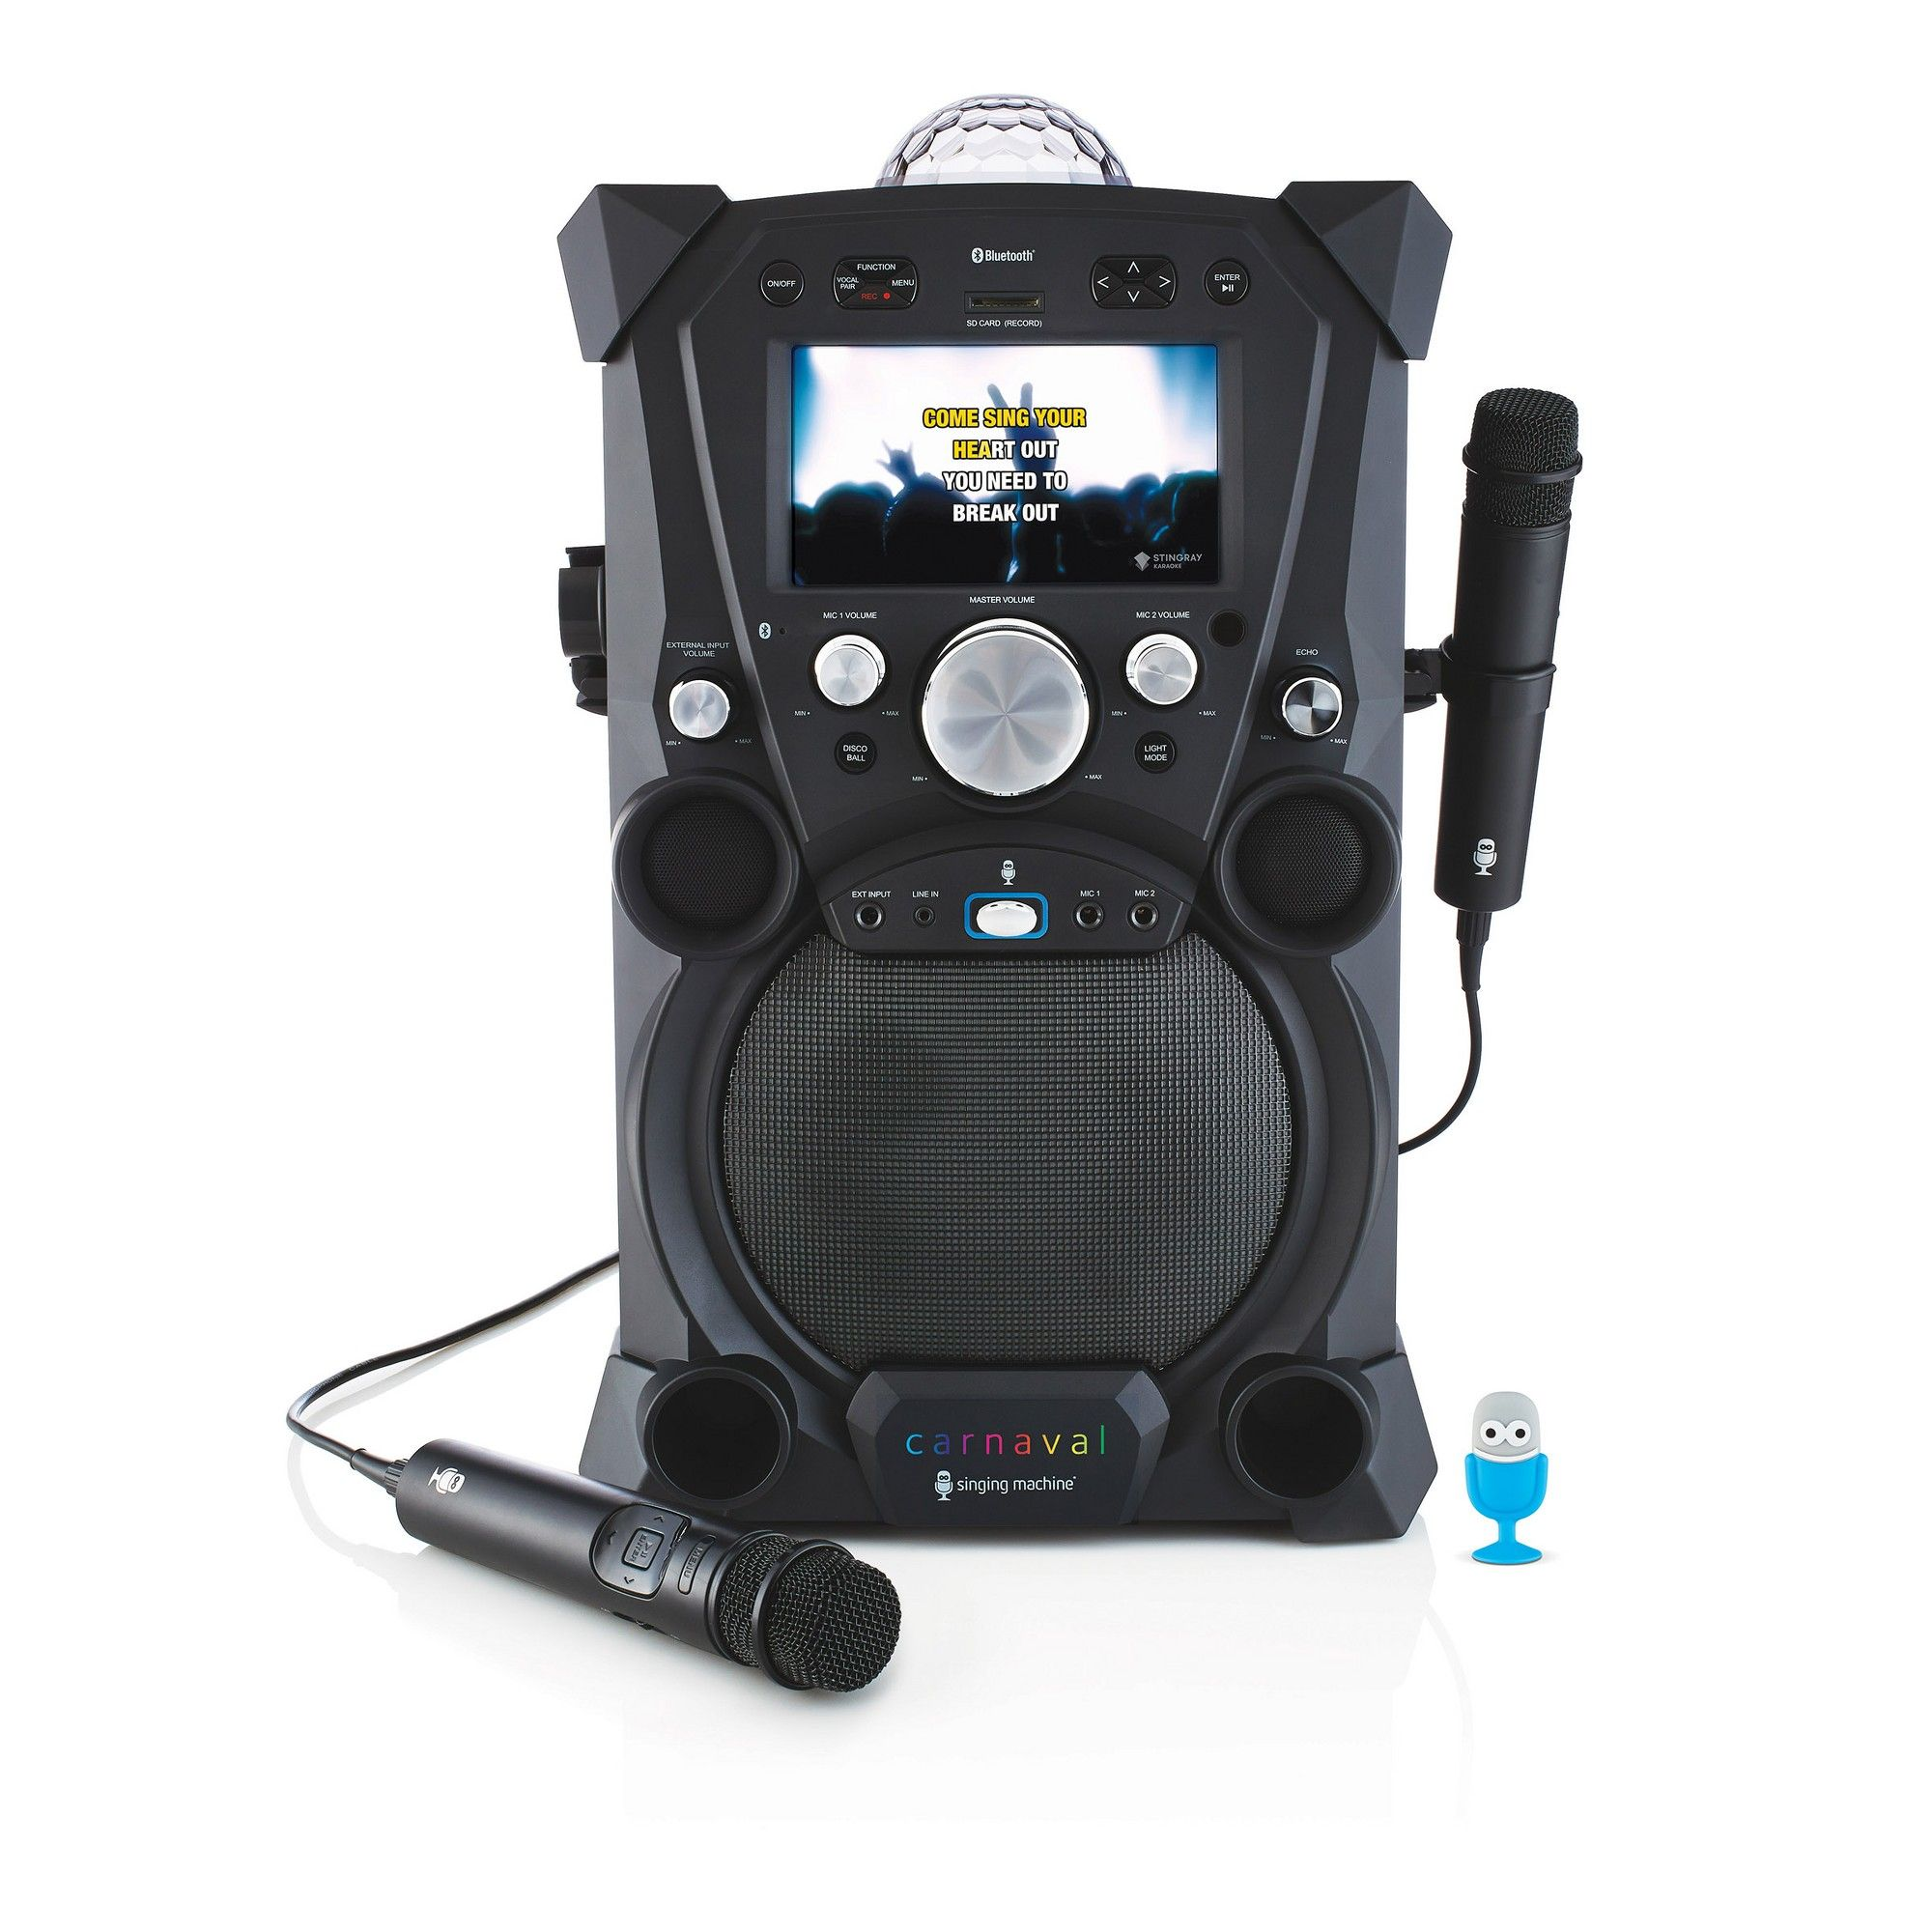 Singing Machine Fiesta Portable Hi-Def Karaoke System, Multi-Colored #karaokesystem